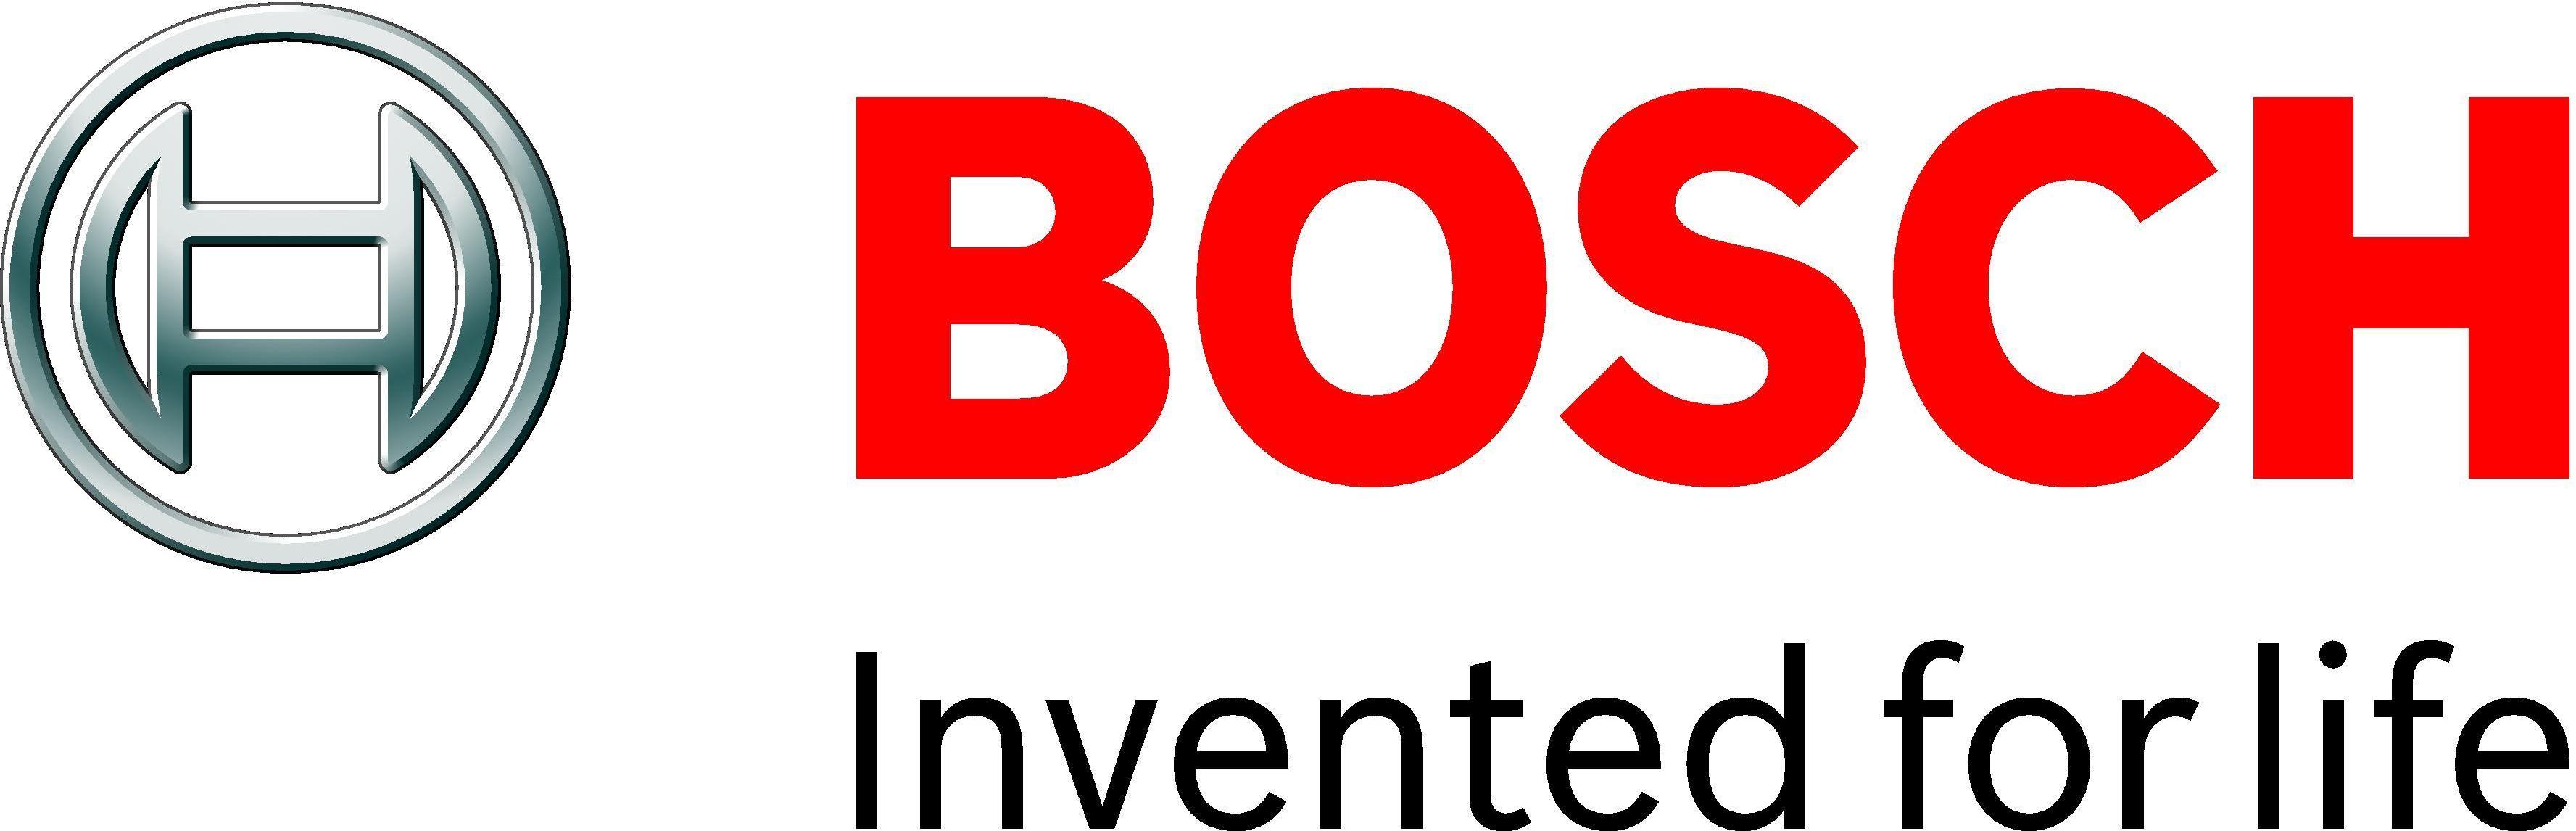 Bosch Logo Dgfdg Chrysler Voyager Home Appliances